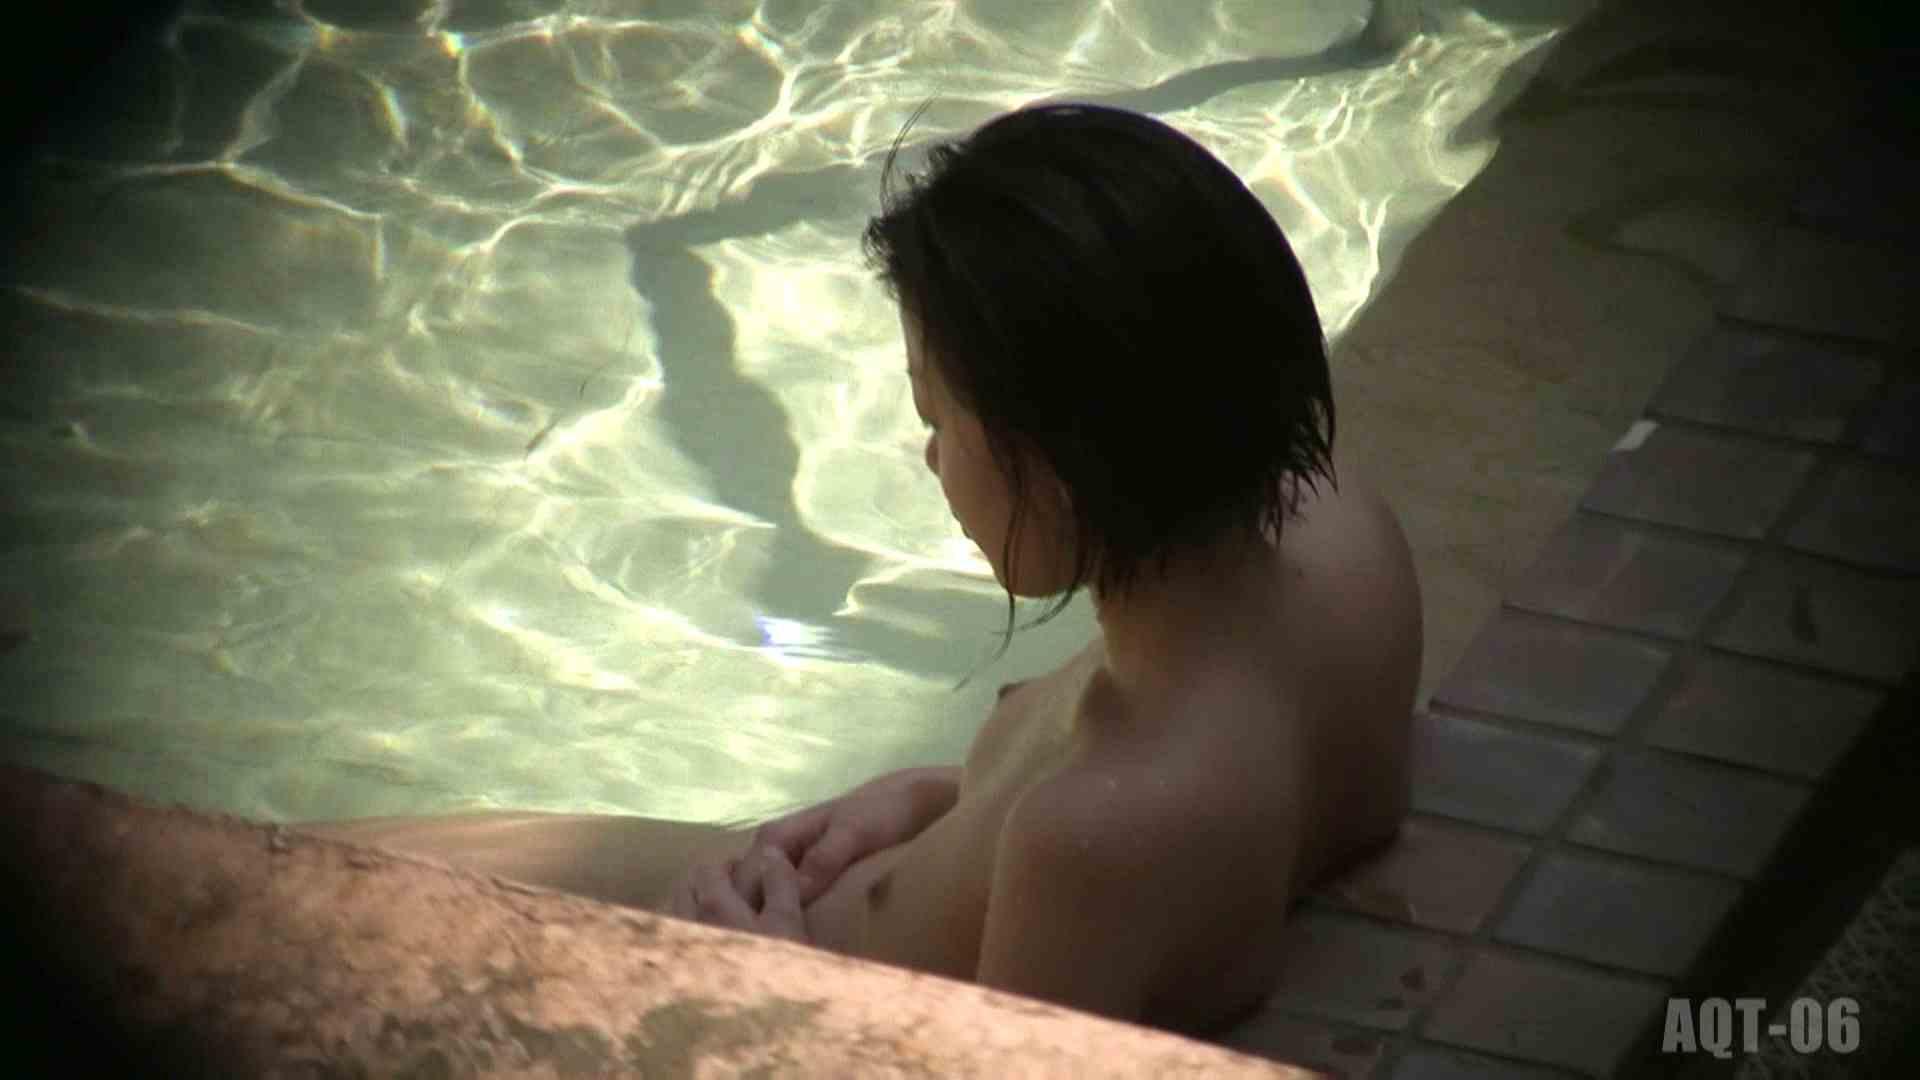 Aquaな露天風呂Vol.756 盗撮特撮  12pic 12